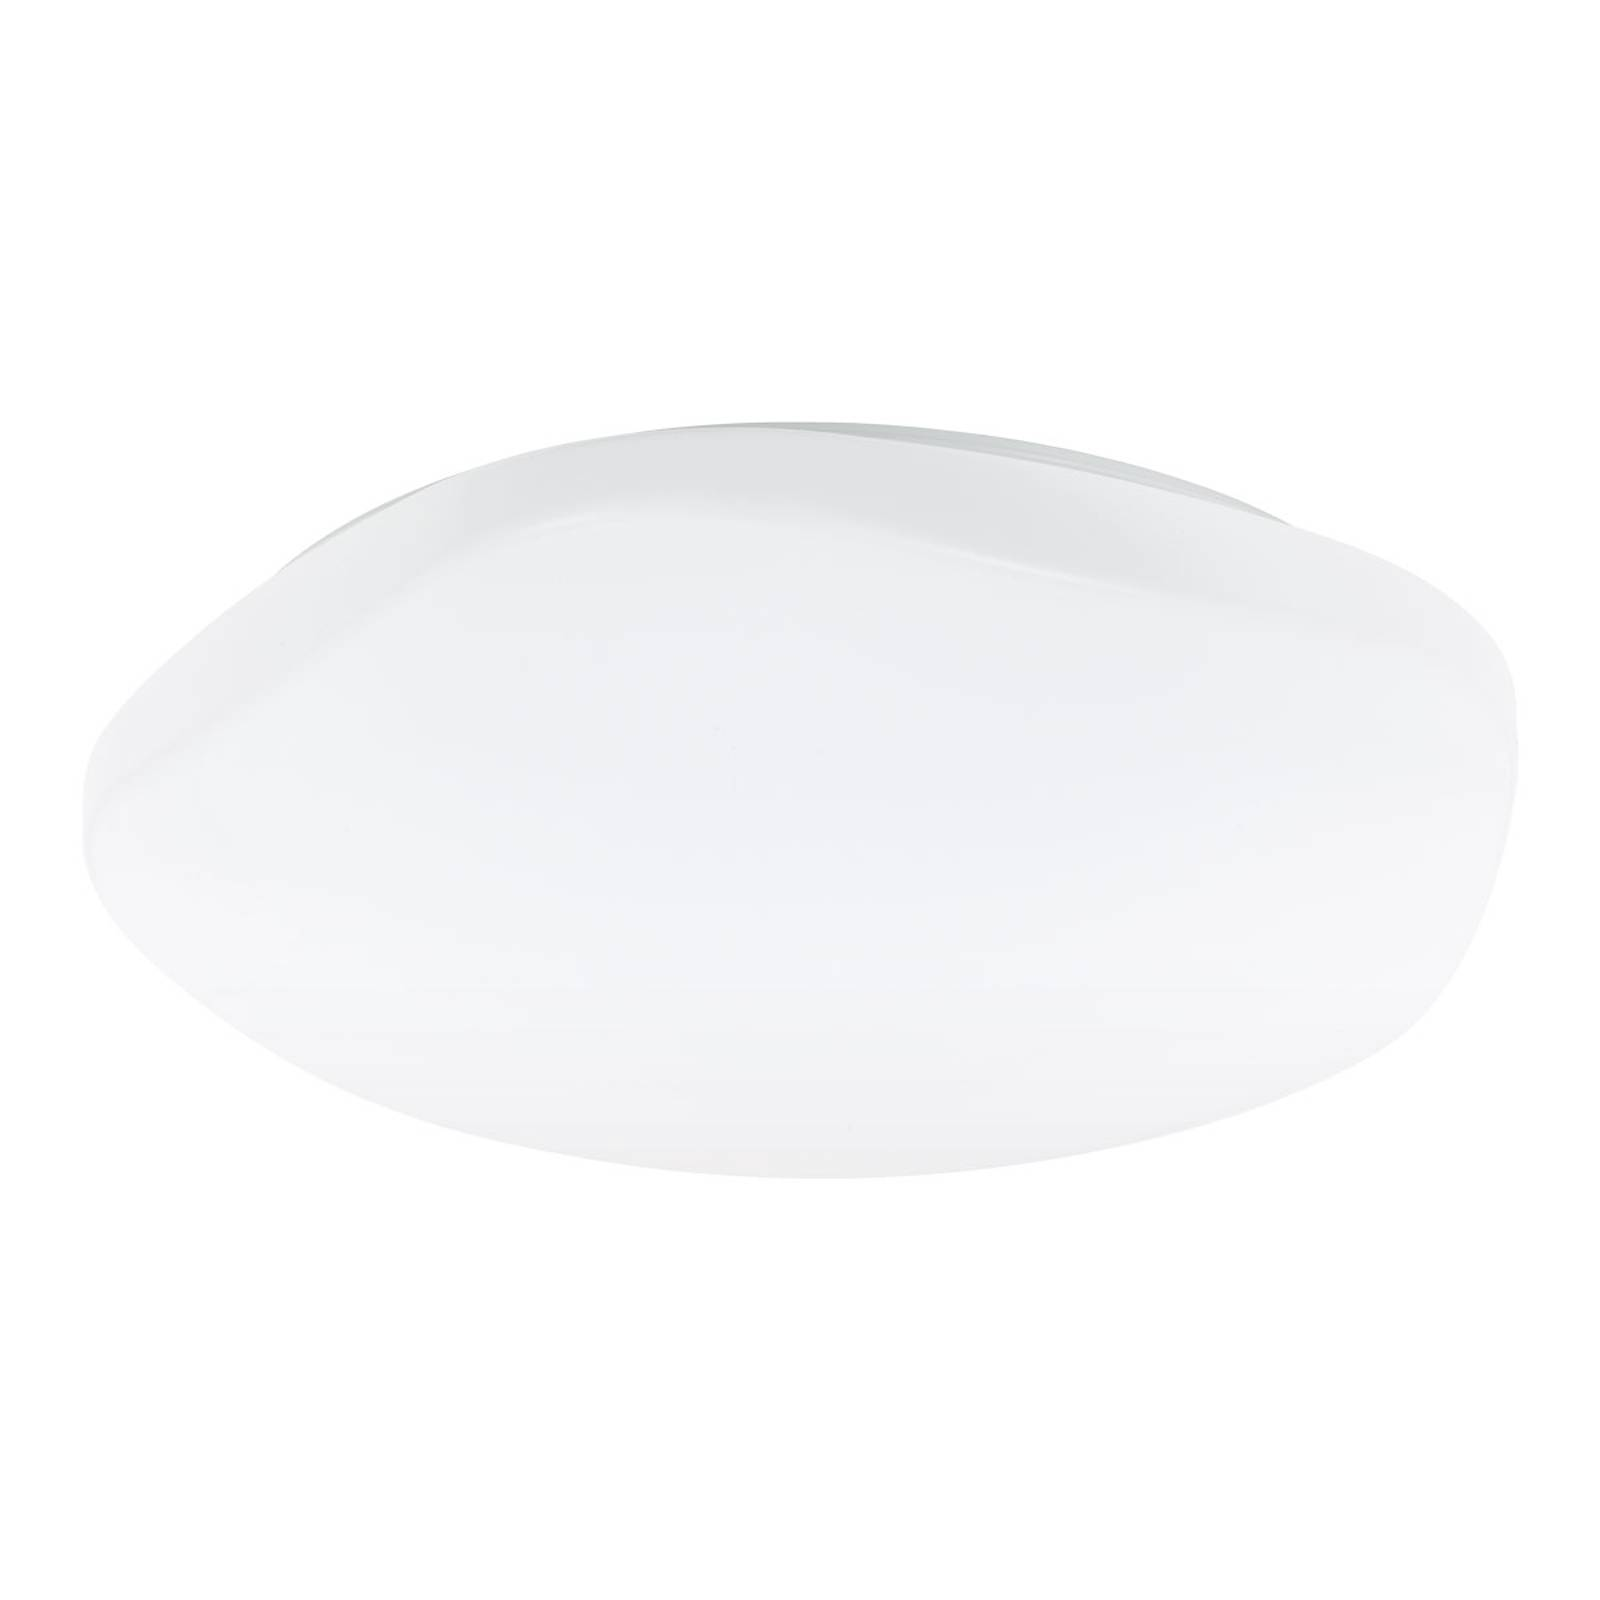 EGLO connect Totari-C LED plafondlamp in wit